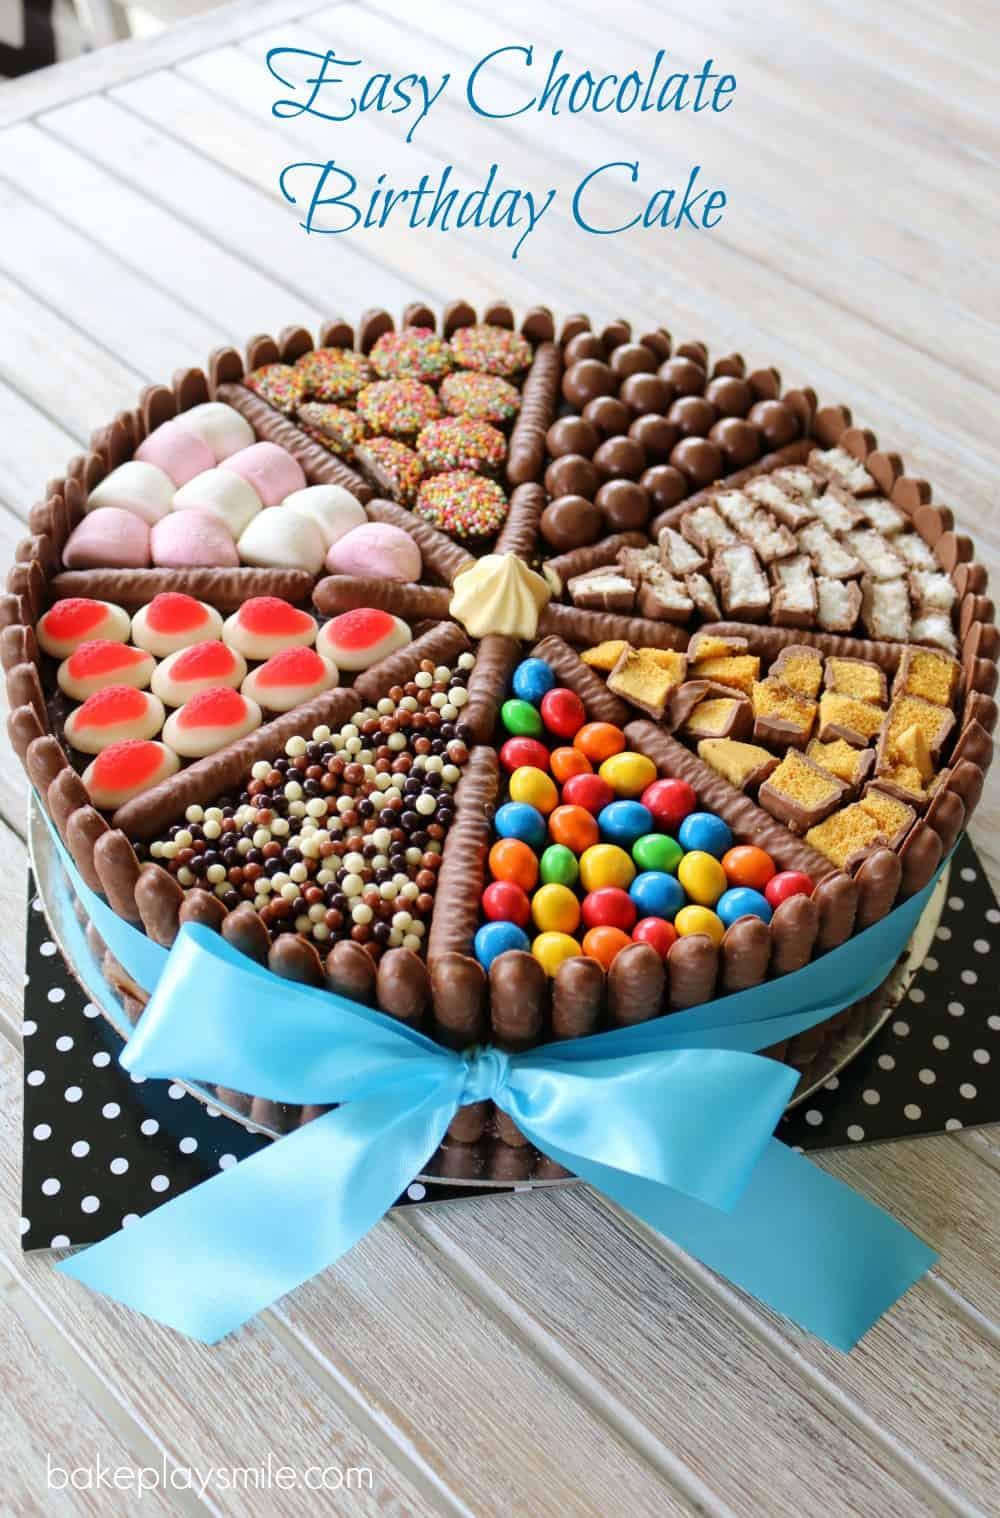 Easy Birthday Cake Ideas  Easy Chocolate Birthday Cake lies chocolates & more